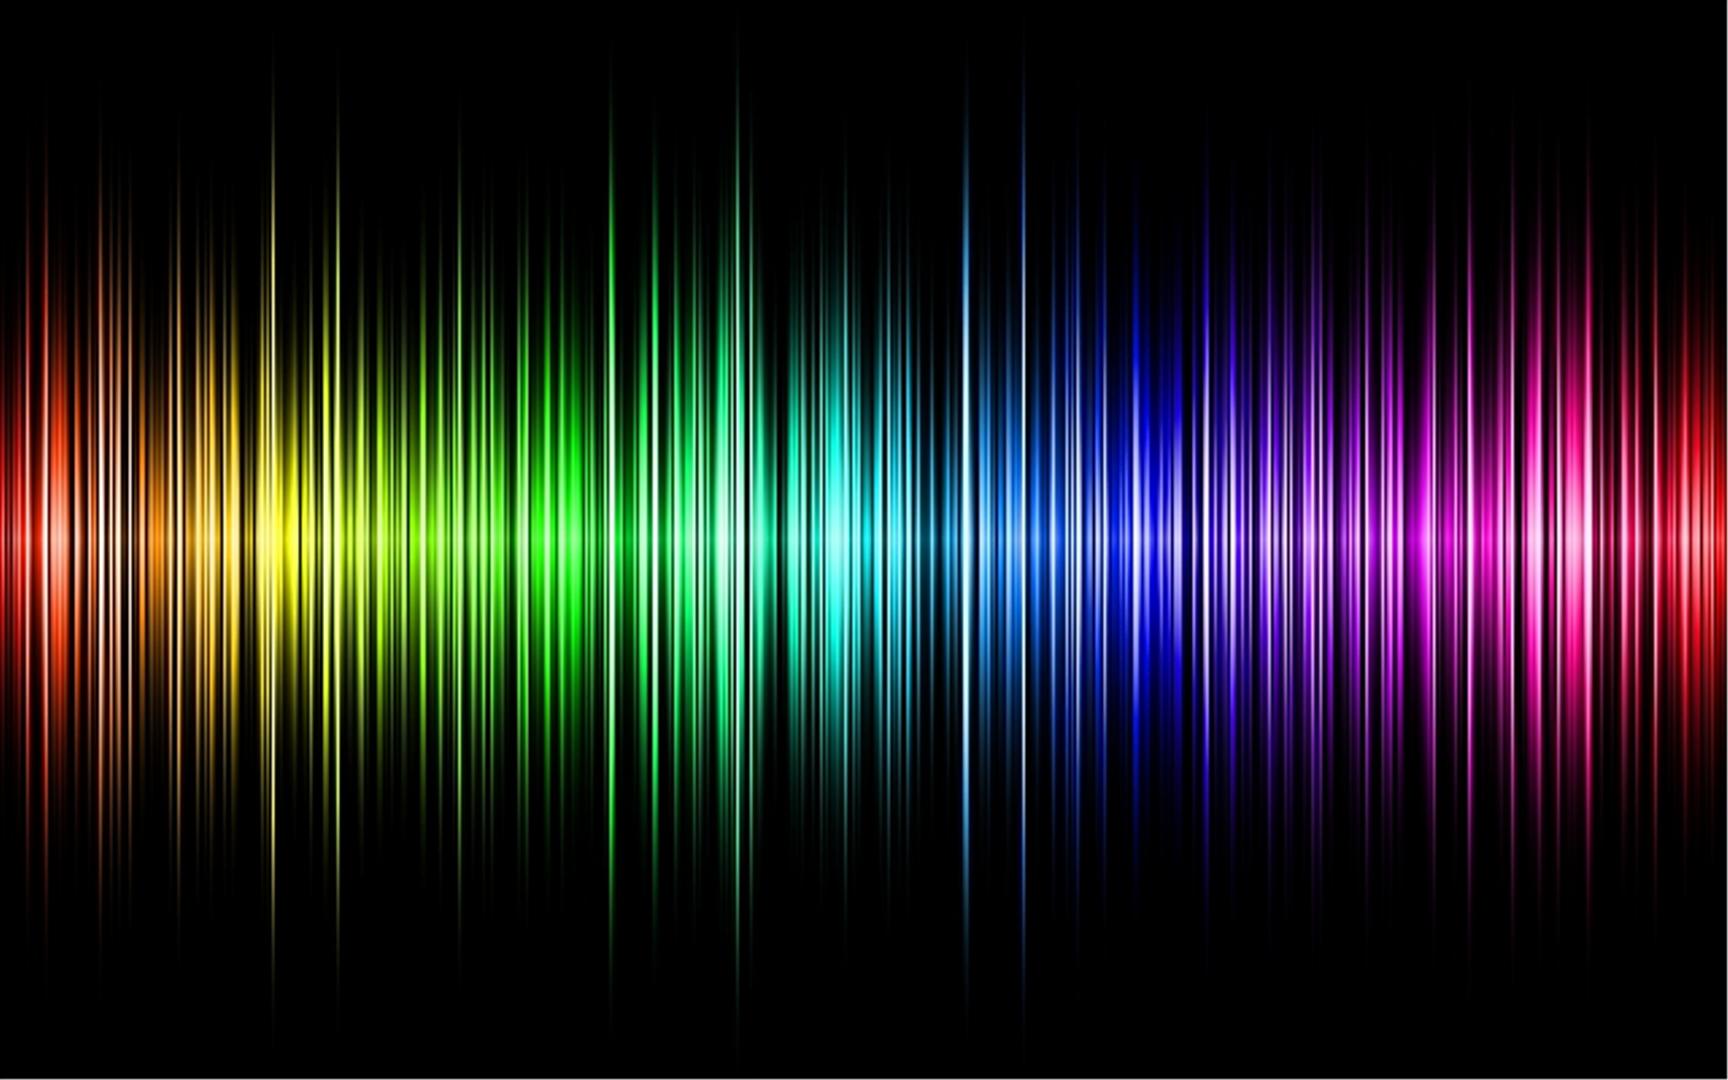 rainbow wave length wallpapers - photo #10